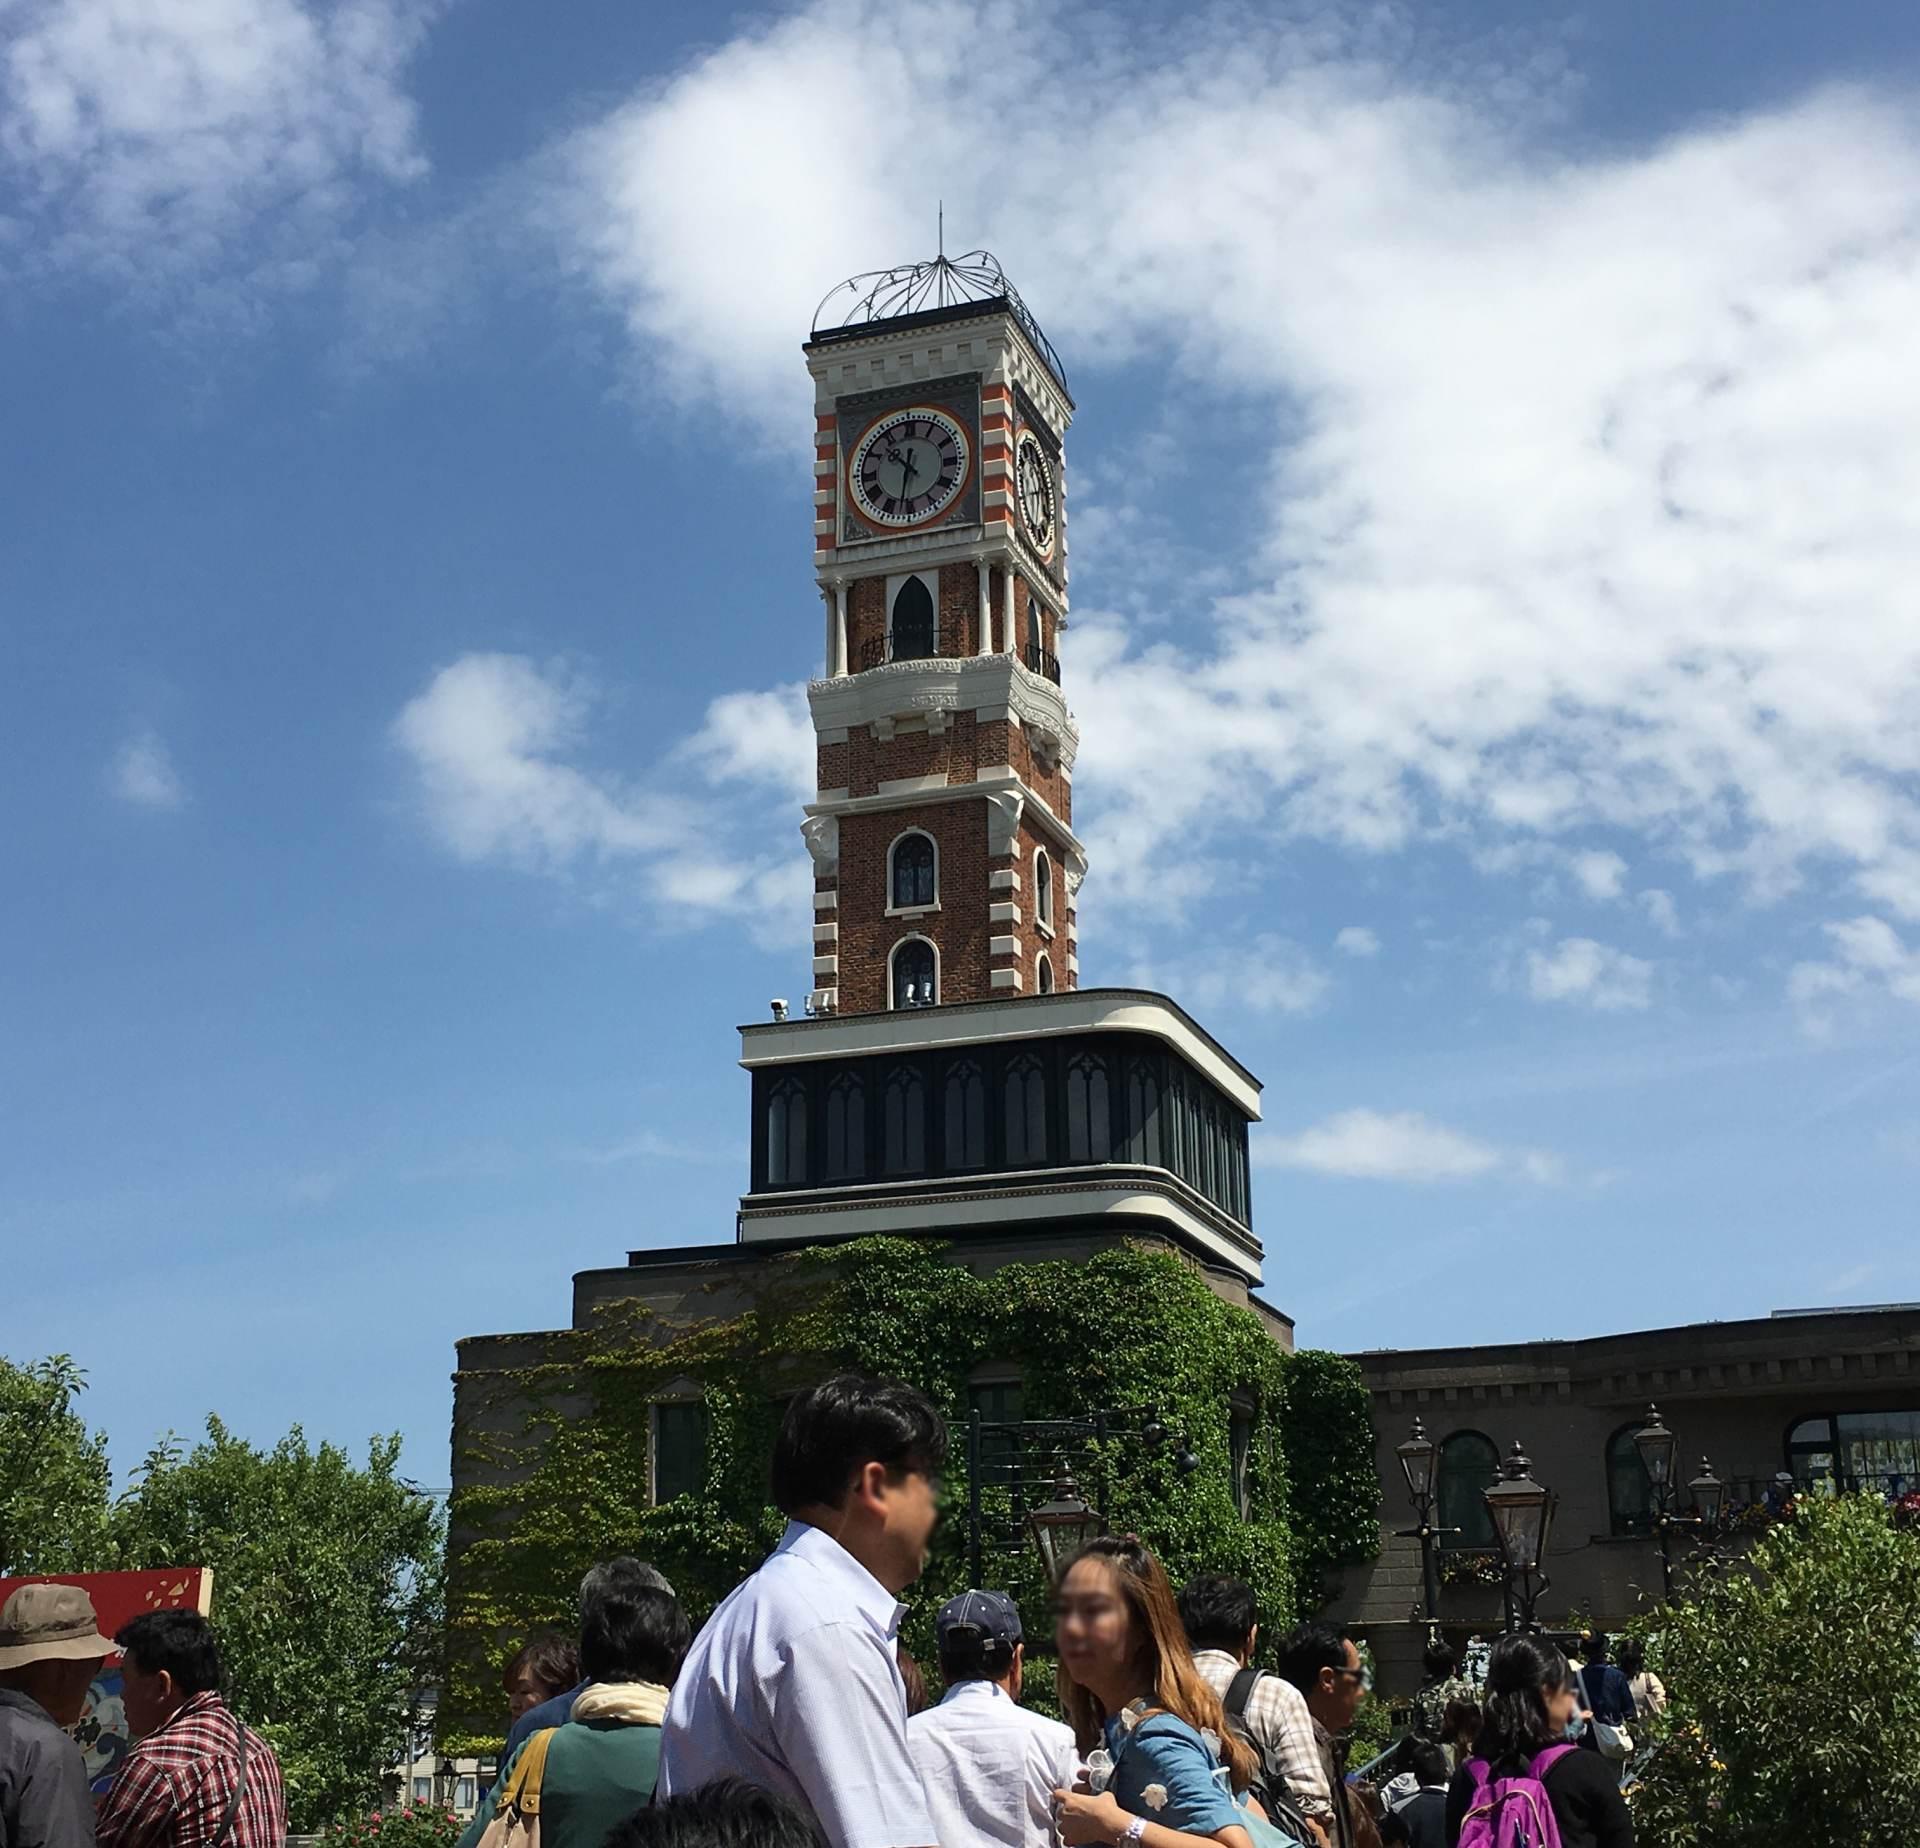 The Sapporo Automaton Clock Tower